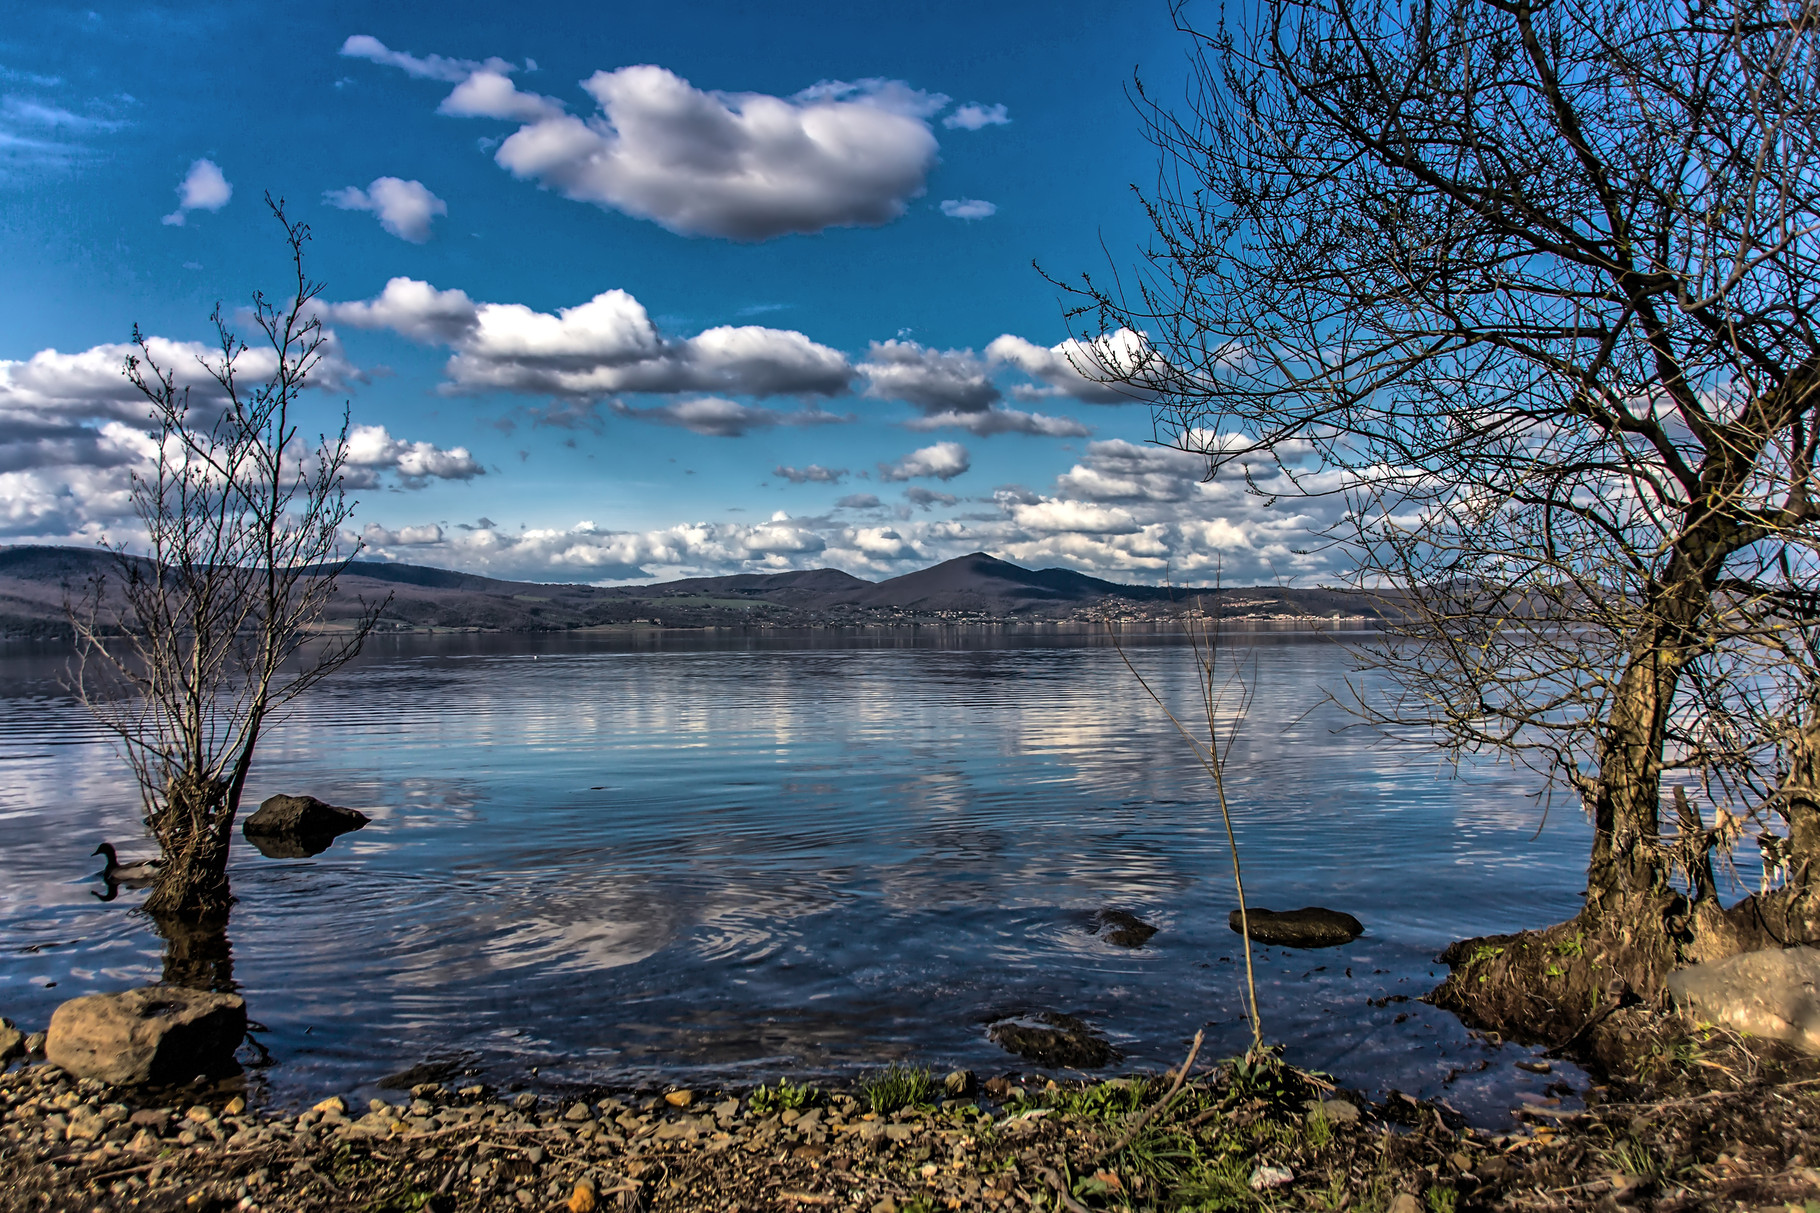 07_Bracciano Lake.